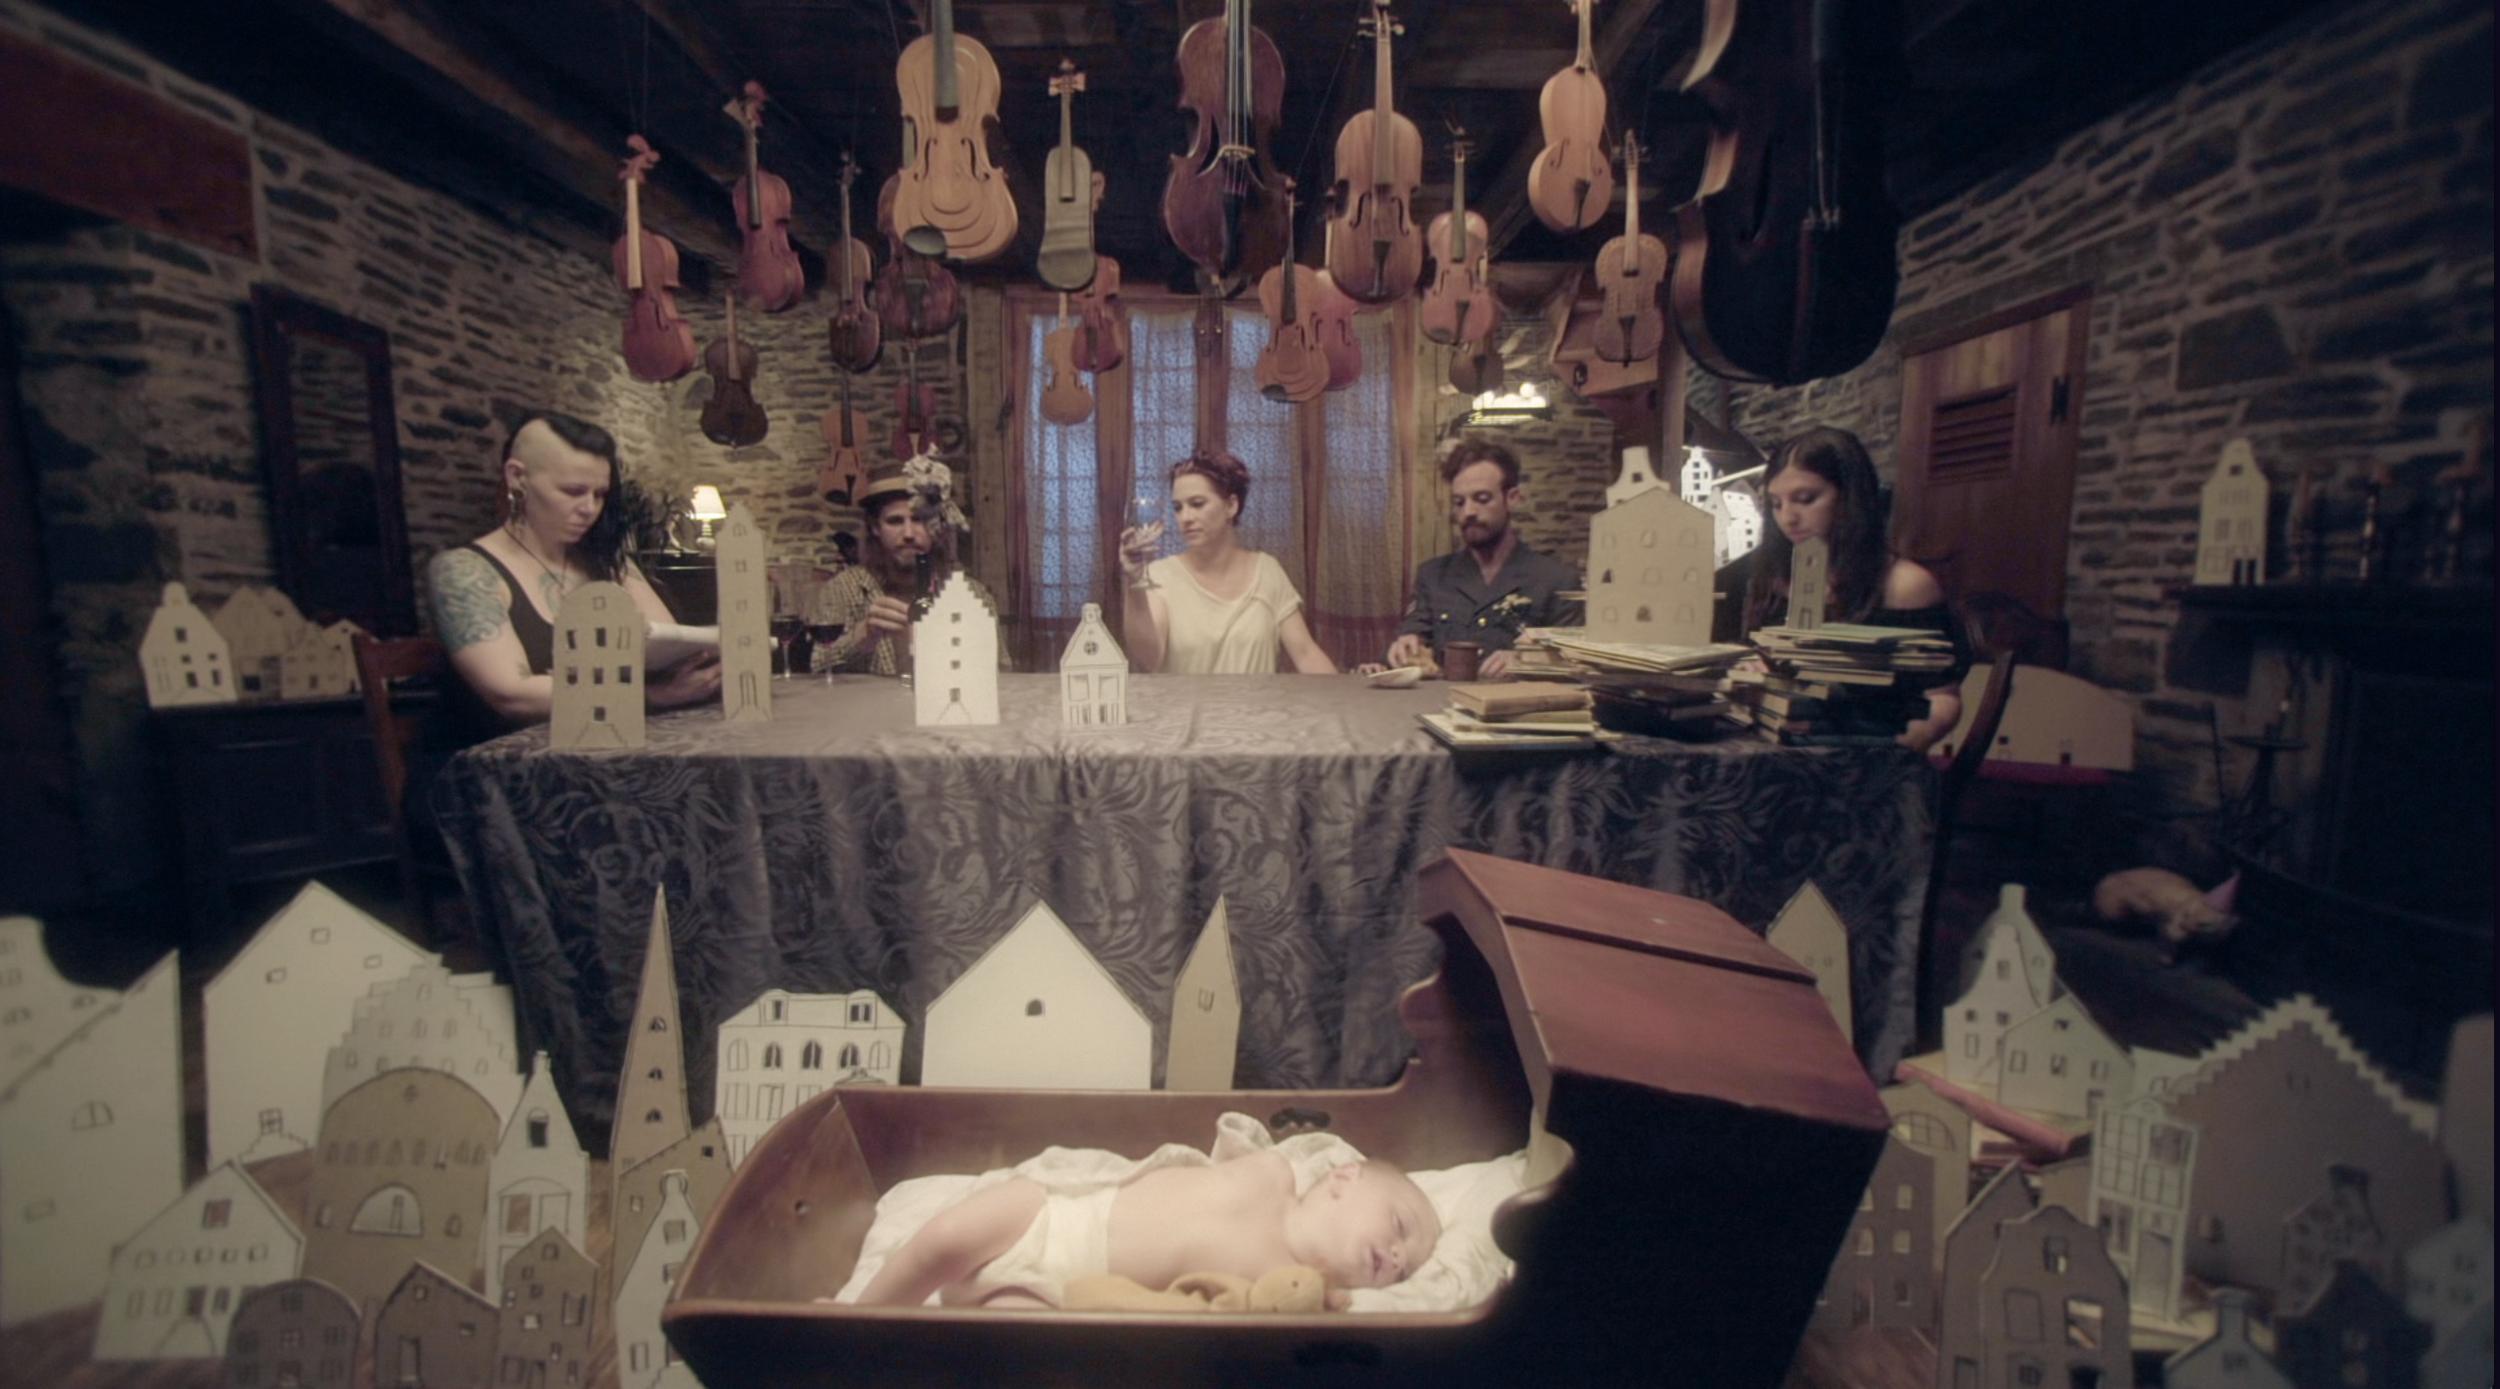 Wynken Blynken & Nod Music Video - Amanda palmer